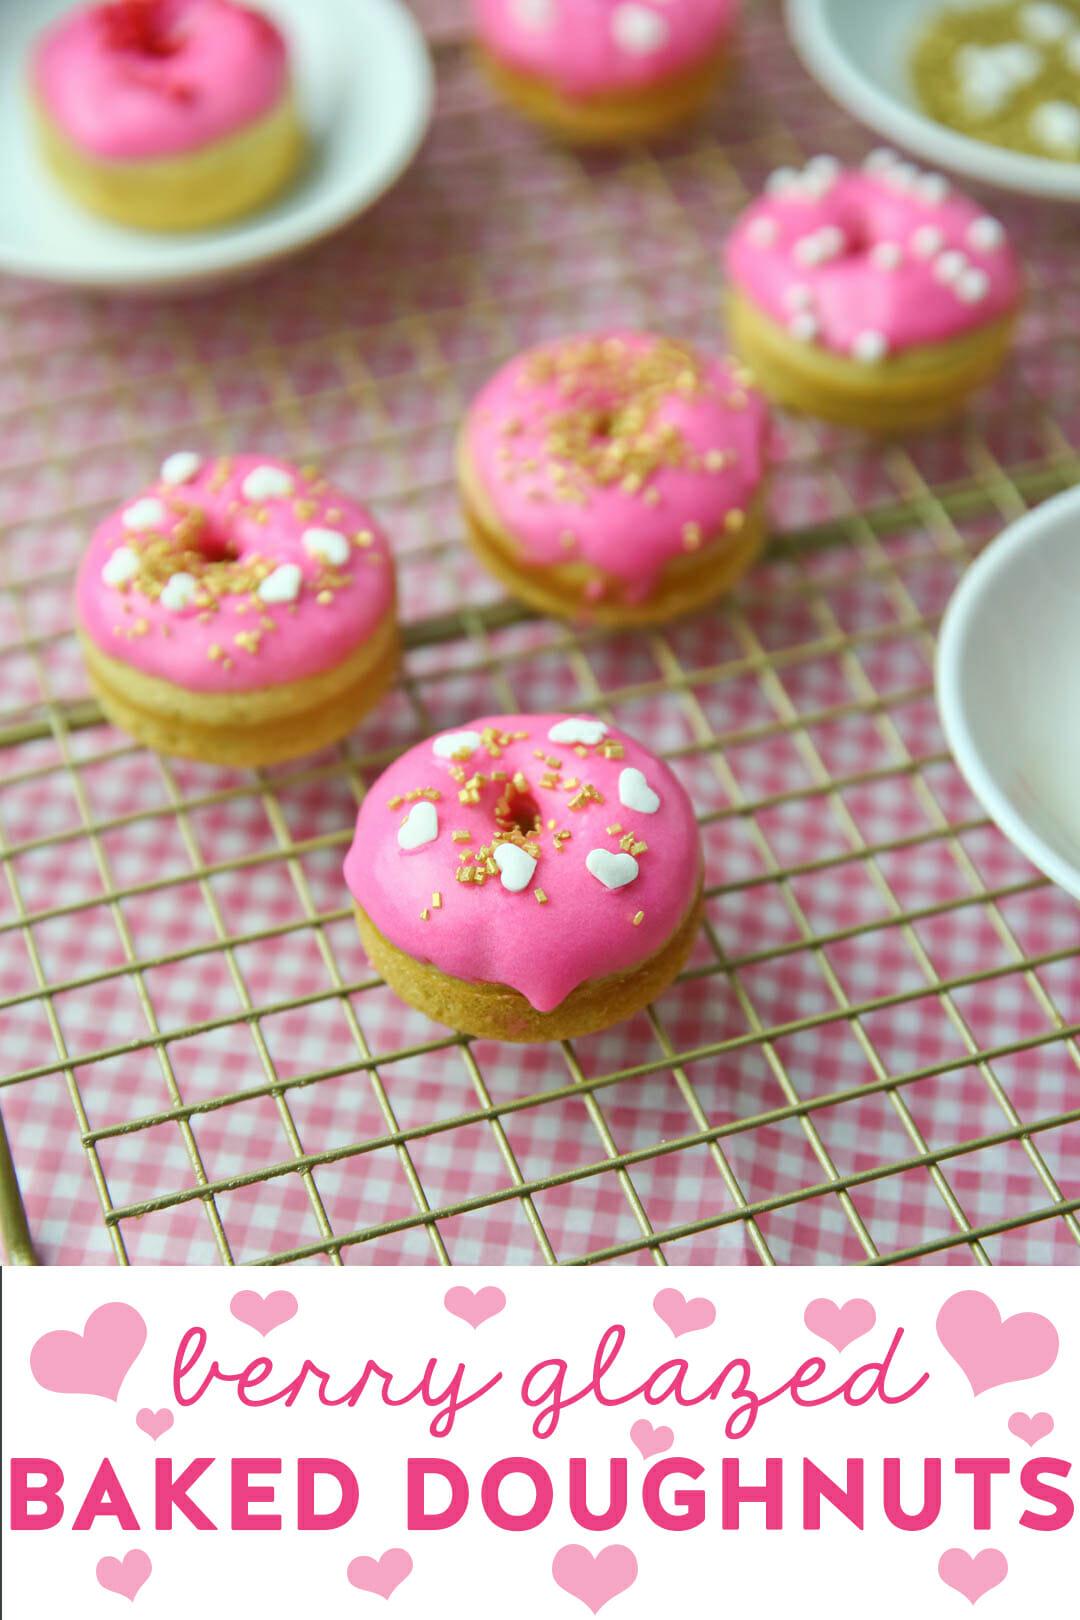 Best Baked Doughnut Recipe